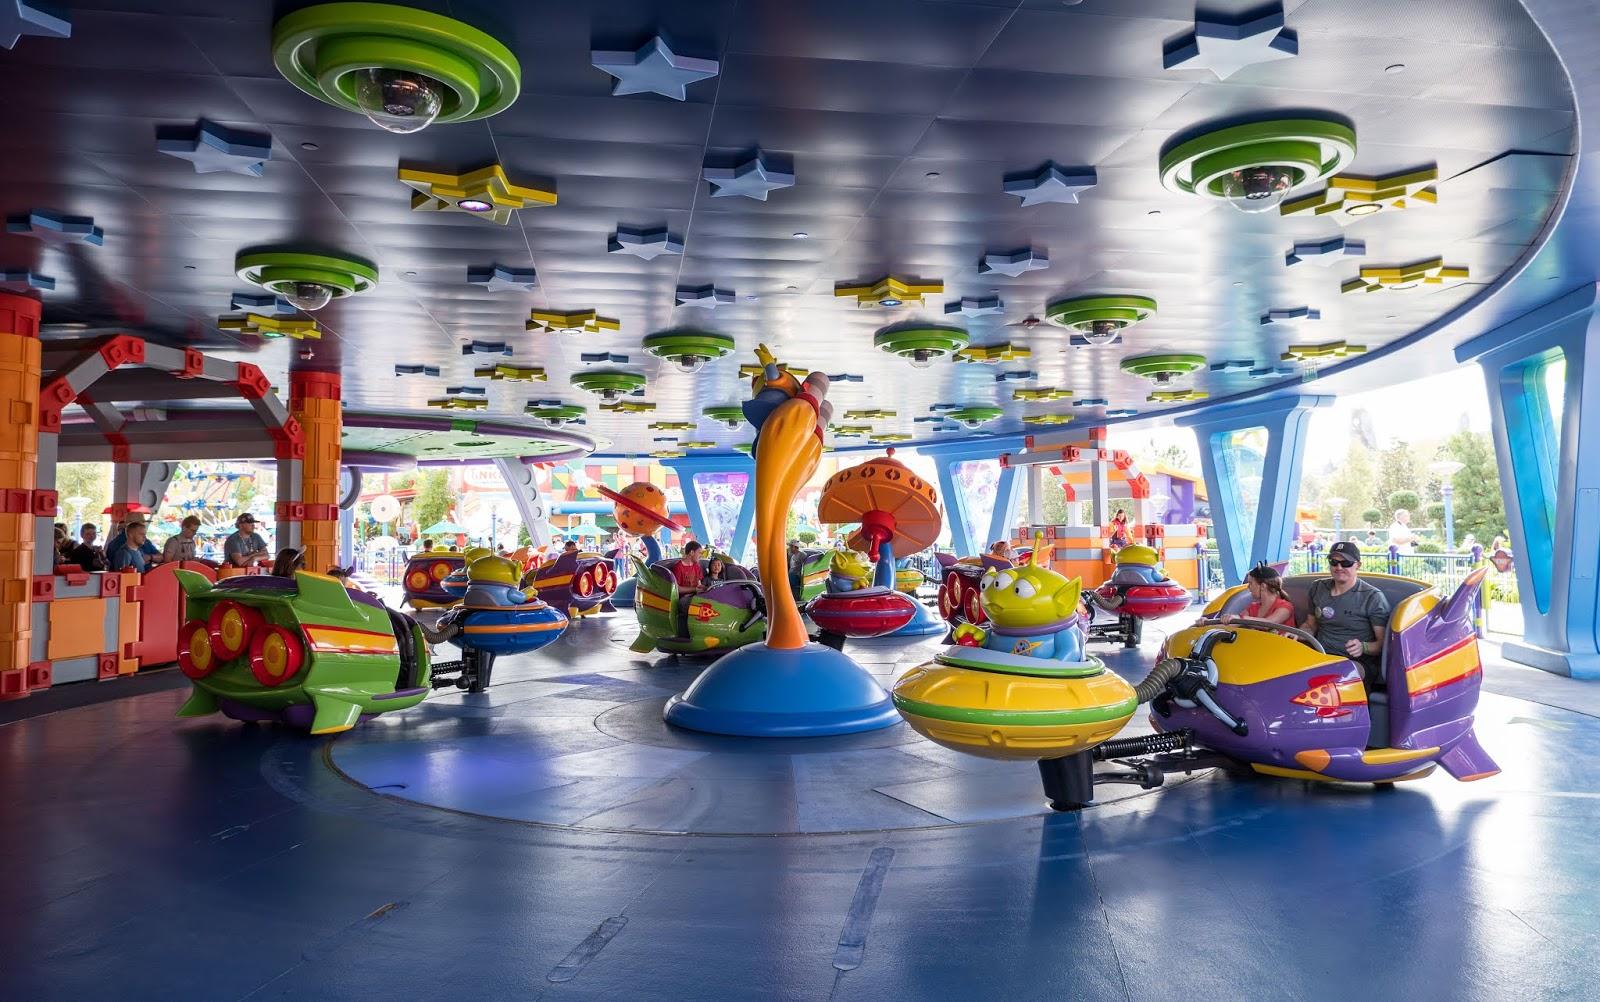 Alien Swirling Saucers at Disney's Hollywood Studios, Walt Disney World